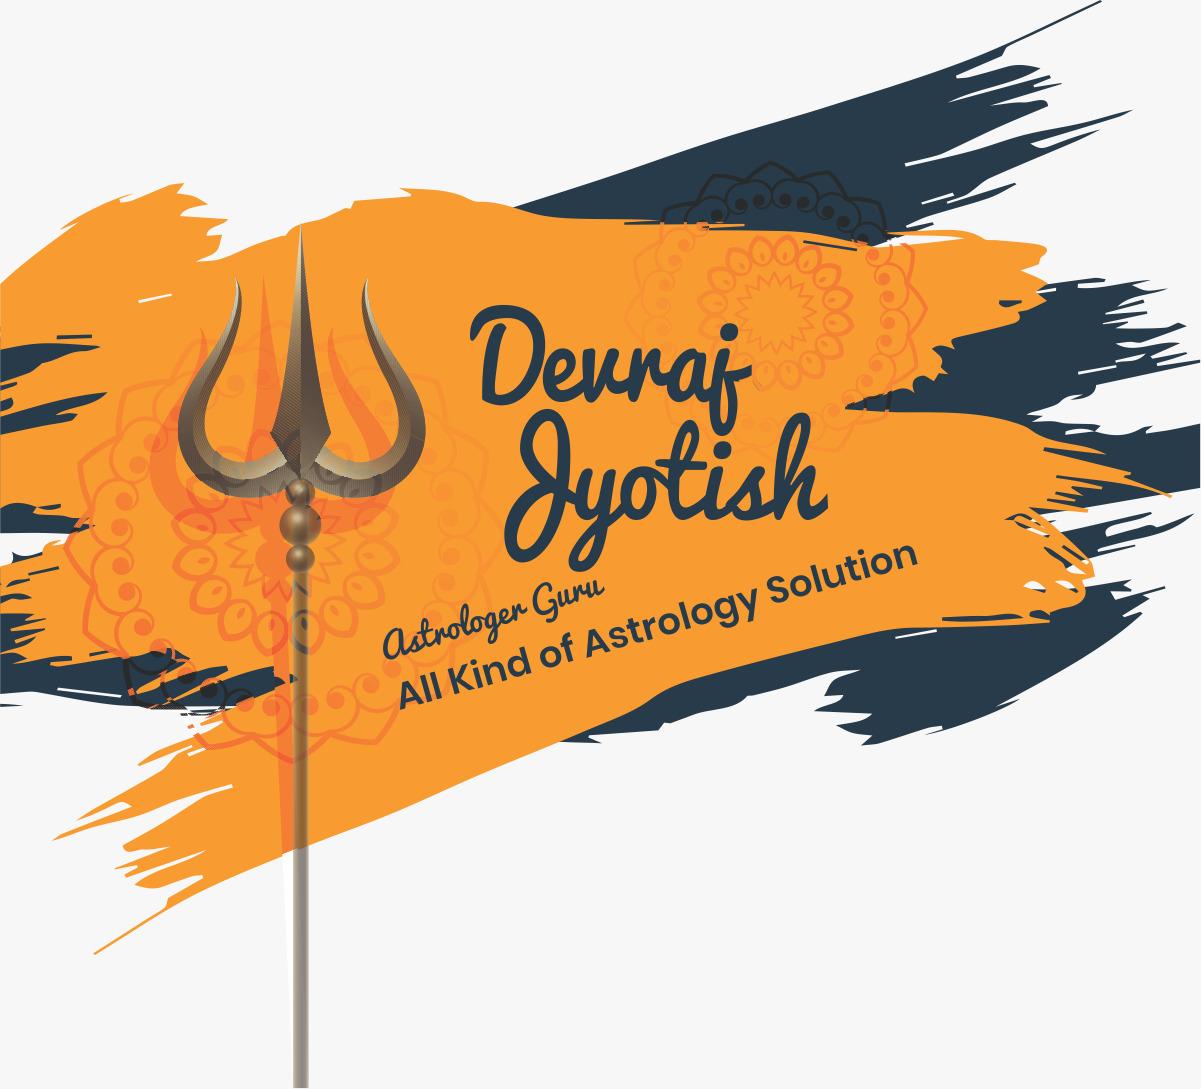 Devraj Jyotish logo